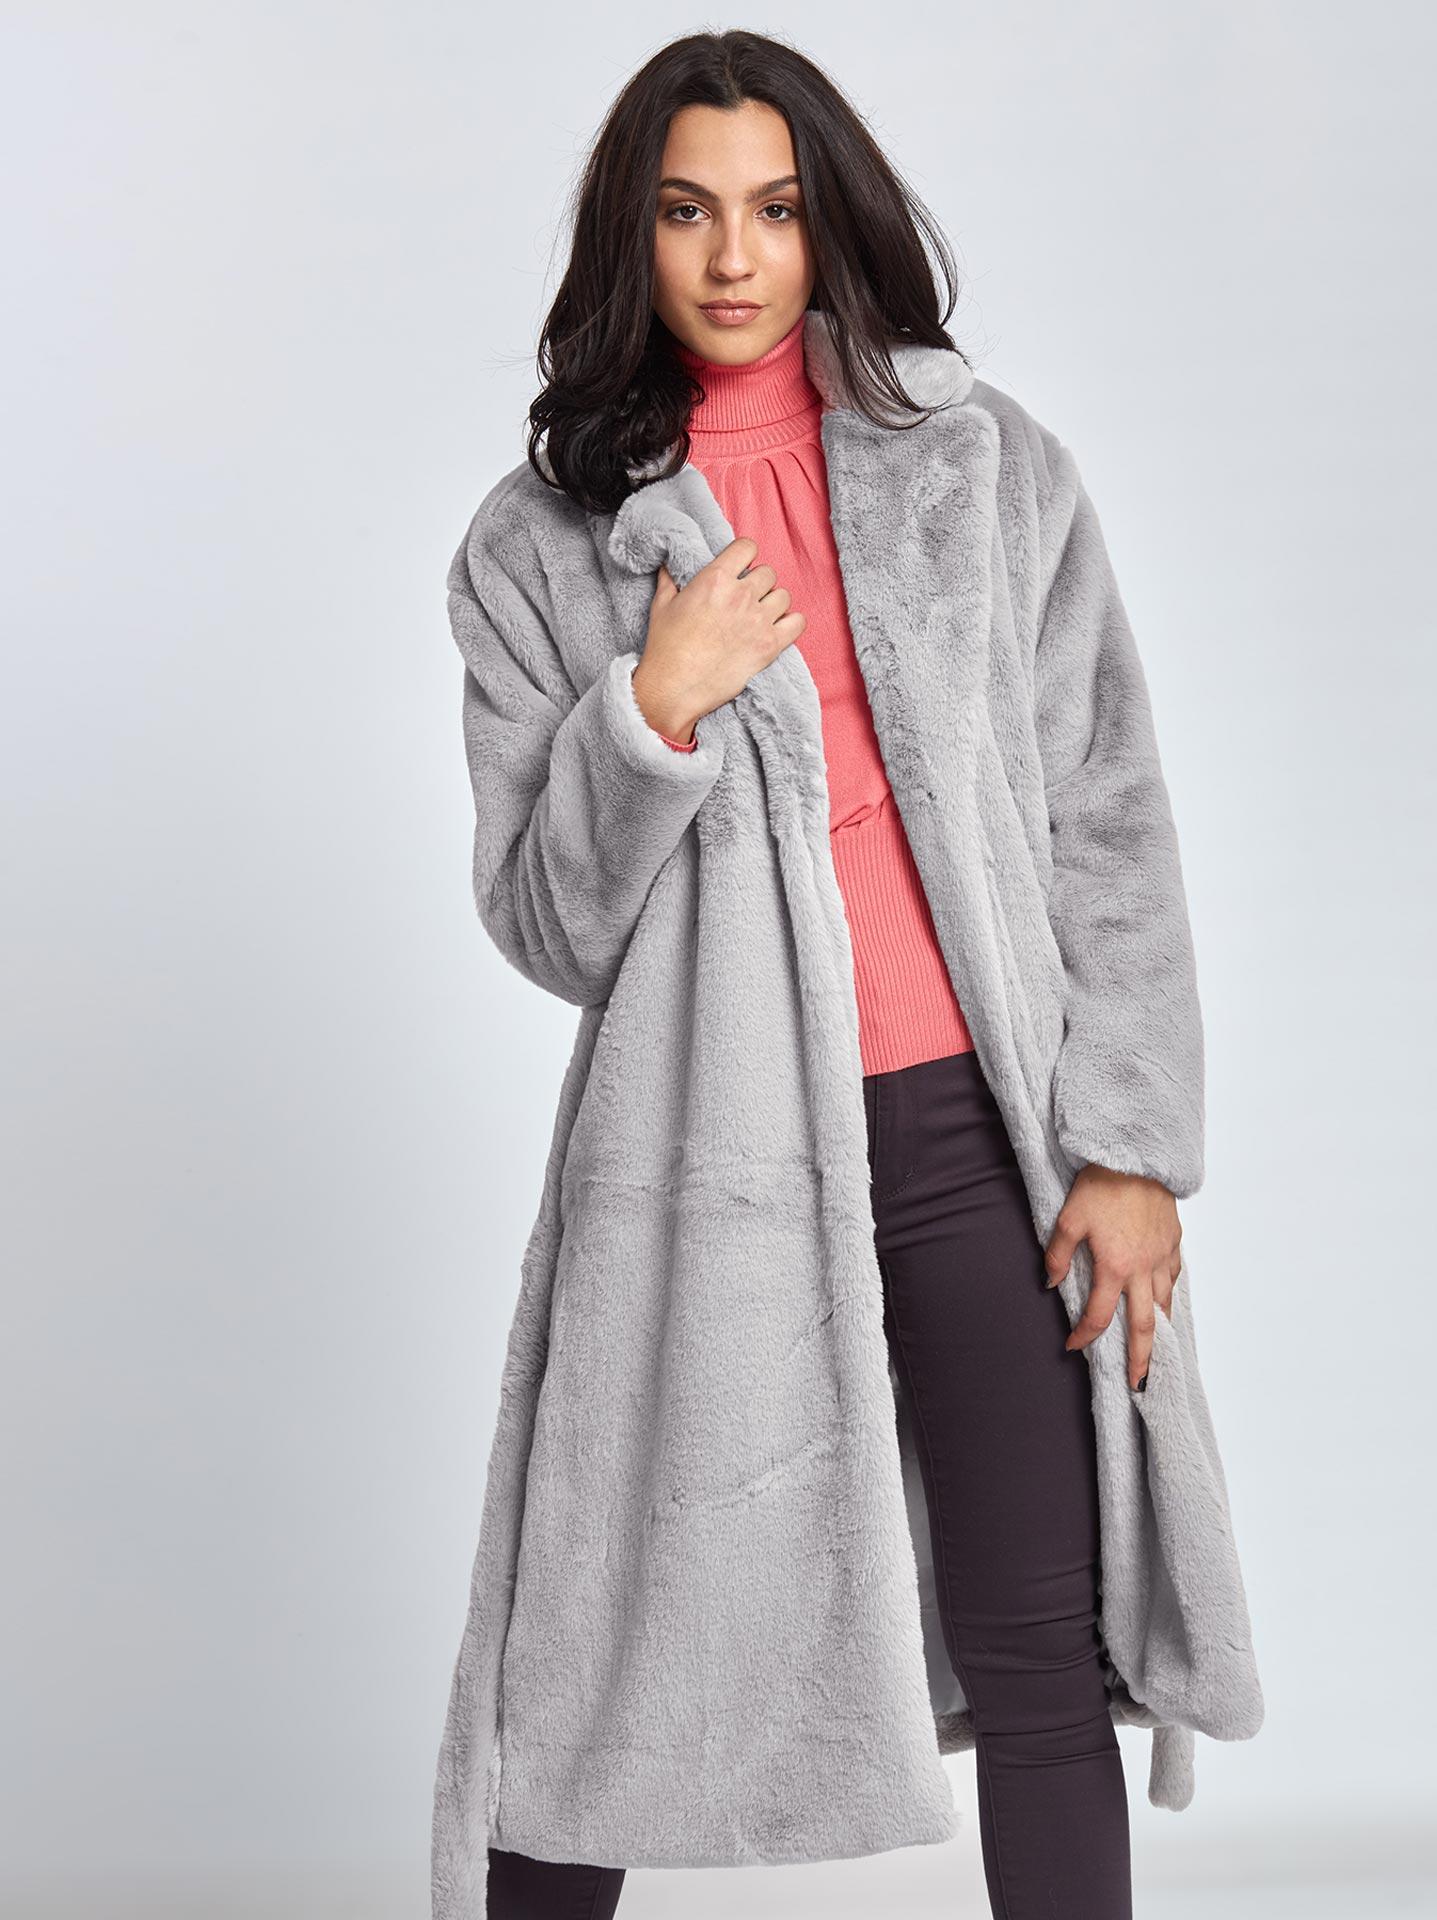 d7867c60e2a0 Μακρύ παλτό από οικολογική-συνθετική γούνα σε γκρι ανοιχτο